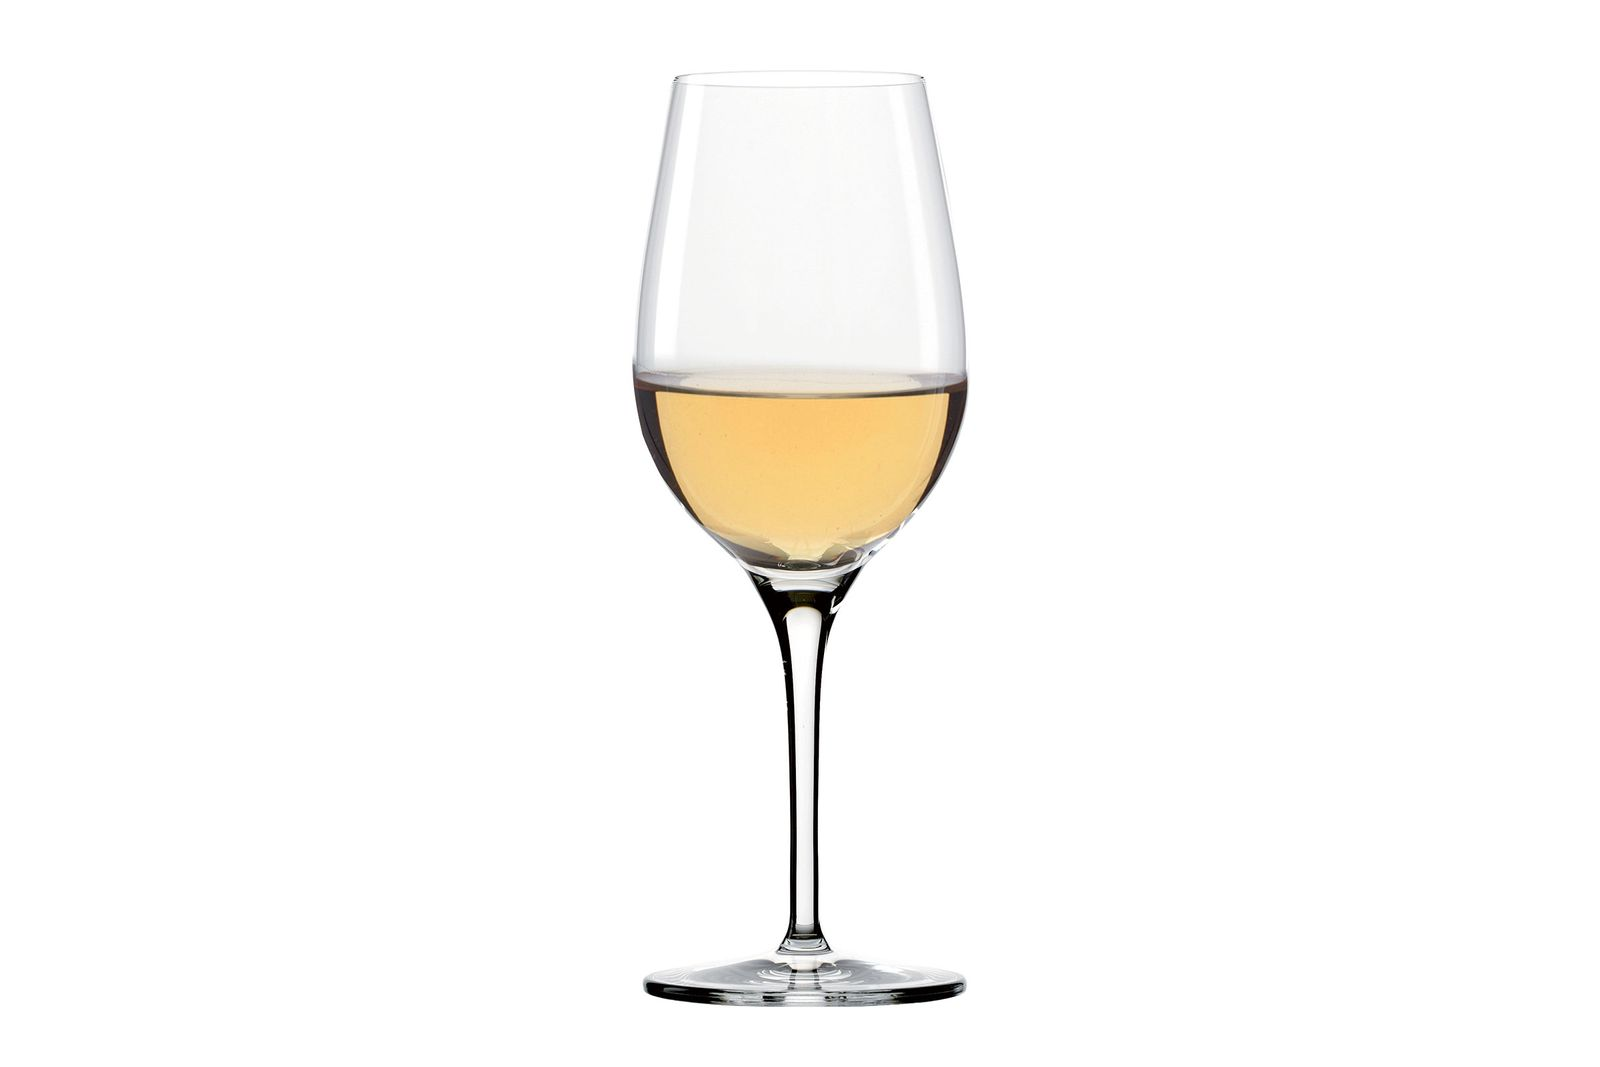 Dartington Crystal Six Set of 6 White Wine Glasses 22.3cm thumb 2